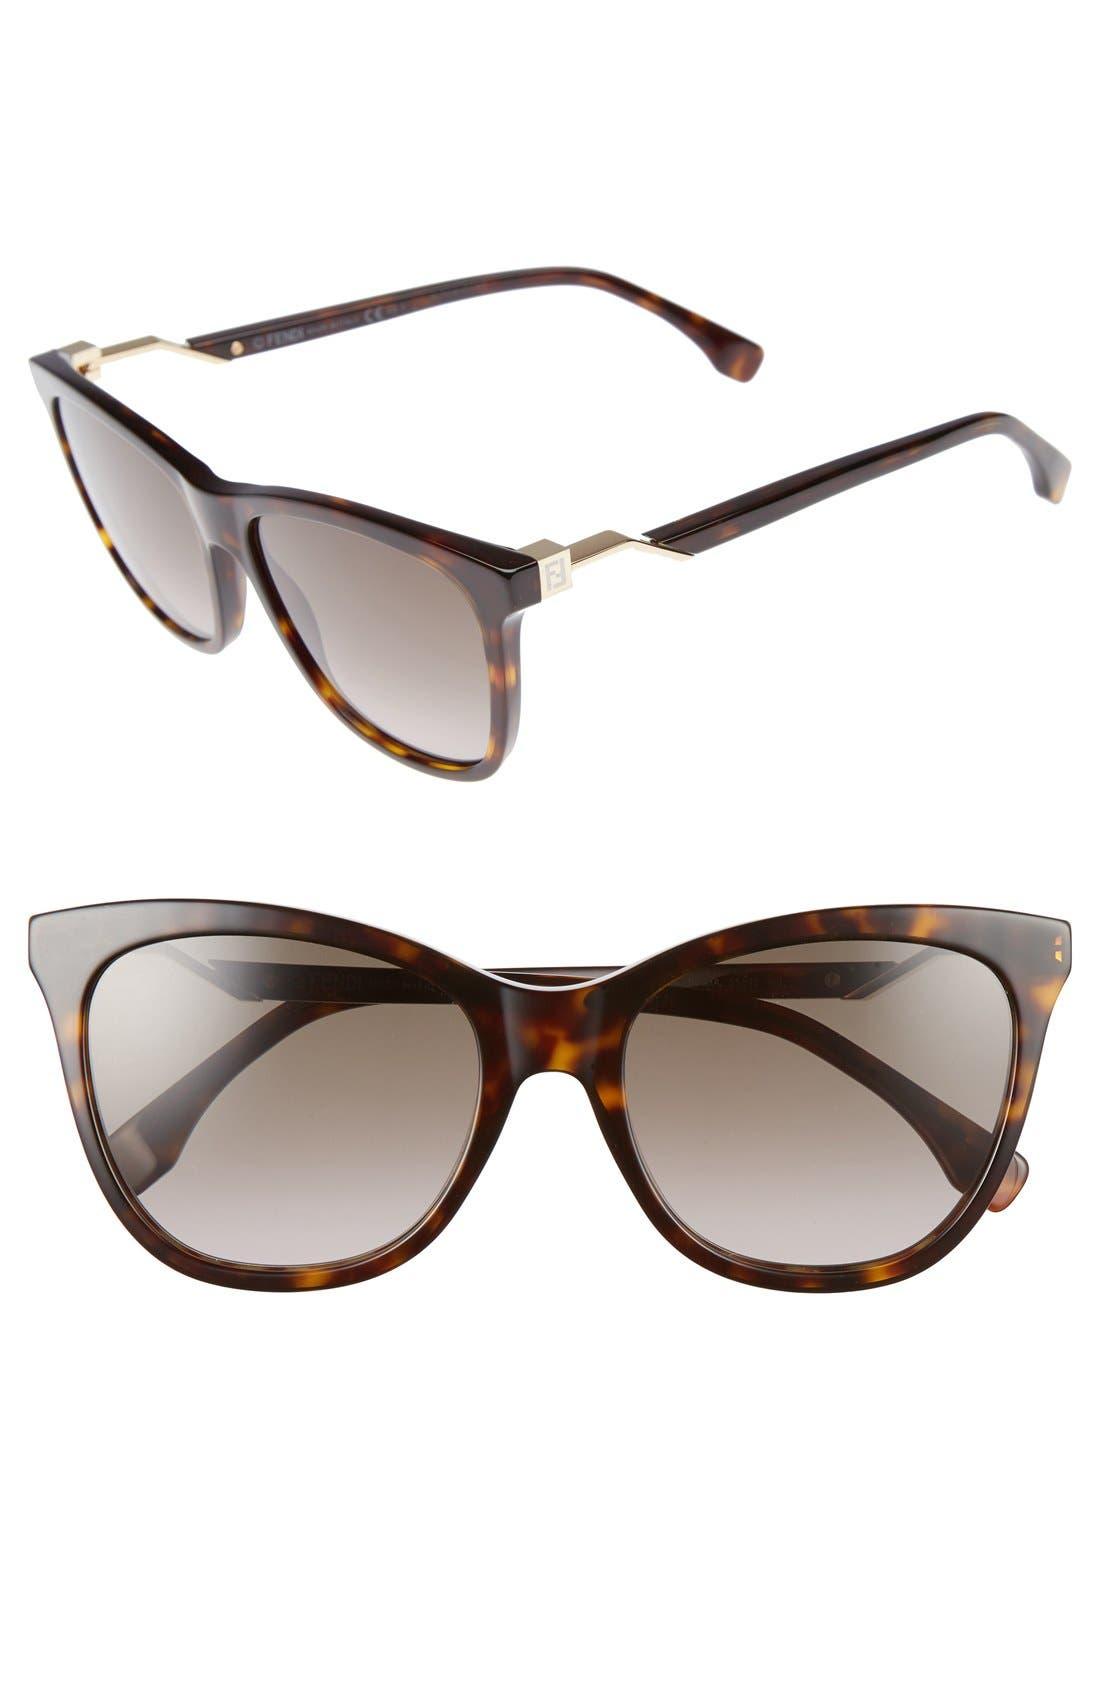 55mm Cube Retro Sunglasses,                             Main thumbnail 2, color,